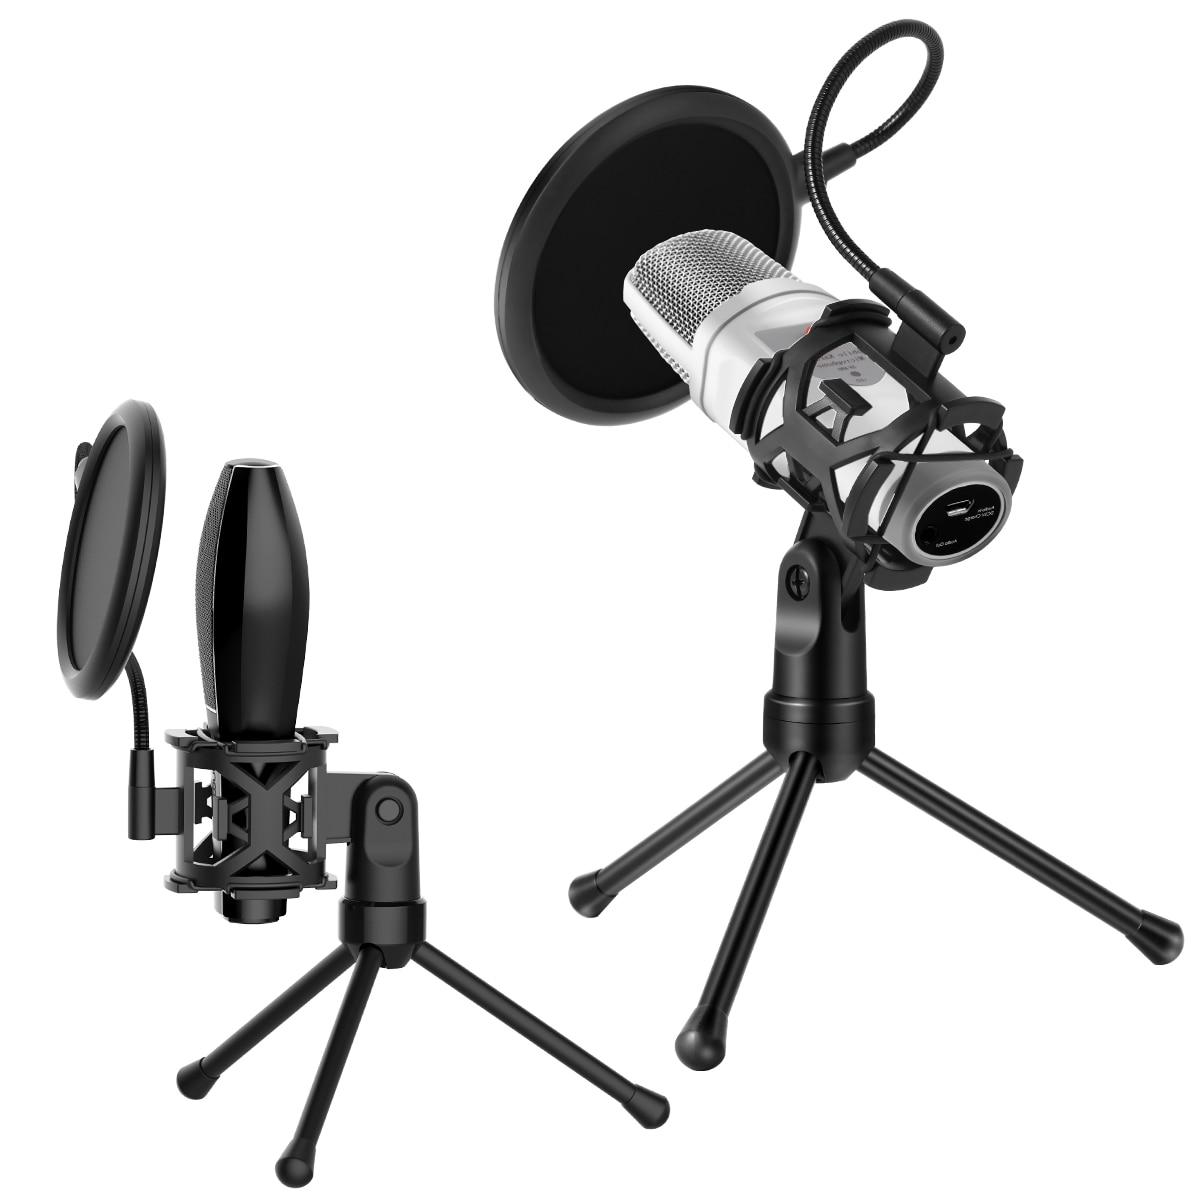 Soporte de micrófono de filtro Pop de pantalla de viento profesional con trípode soporte de micrófono para escritorio soporte de choque